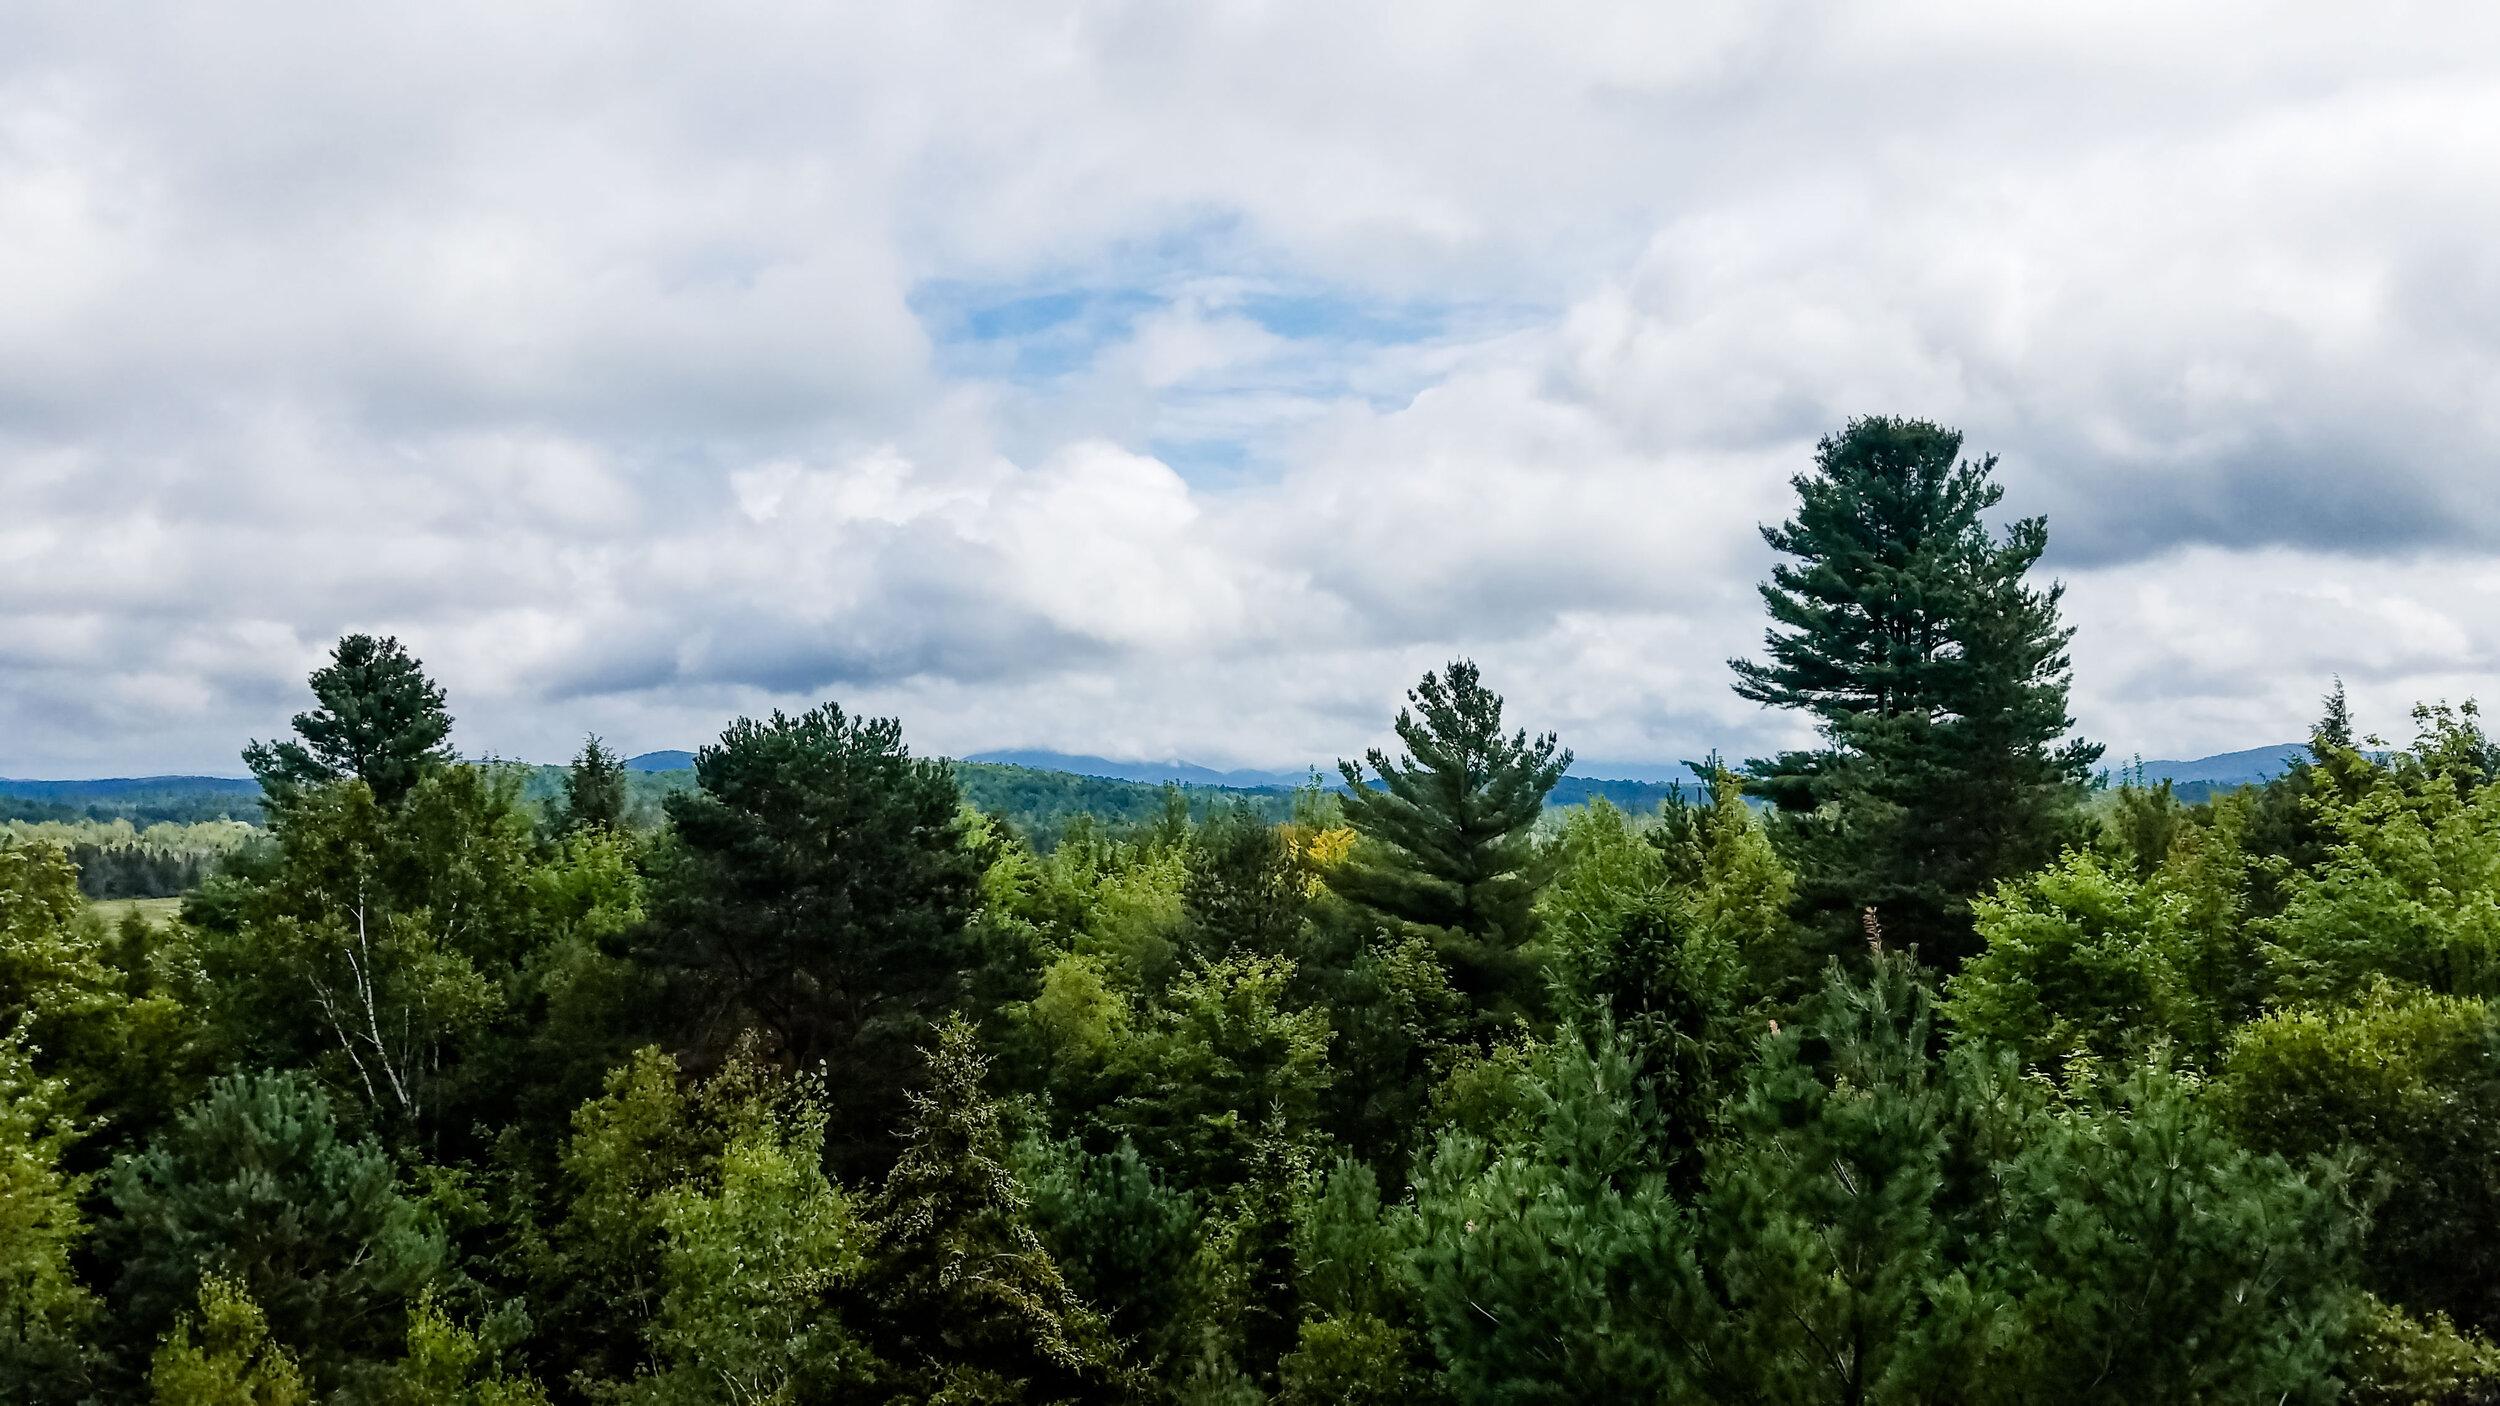 The Adirondacks via  The Wild Center